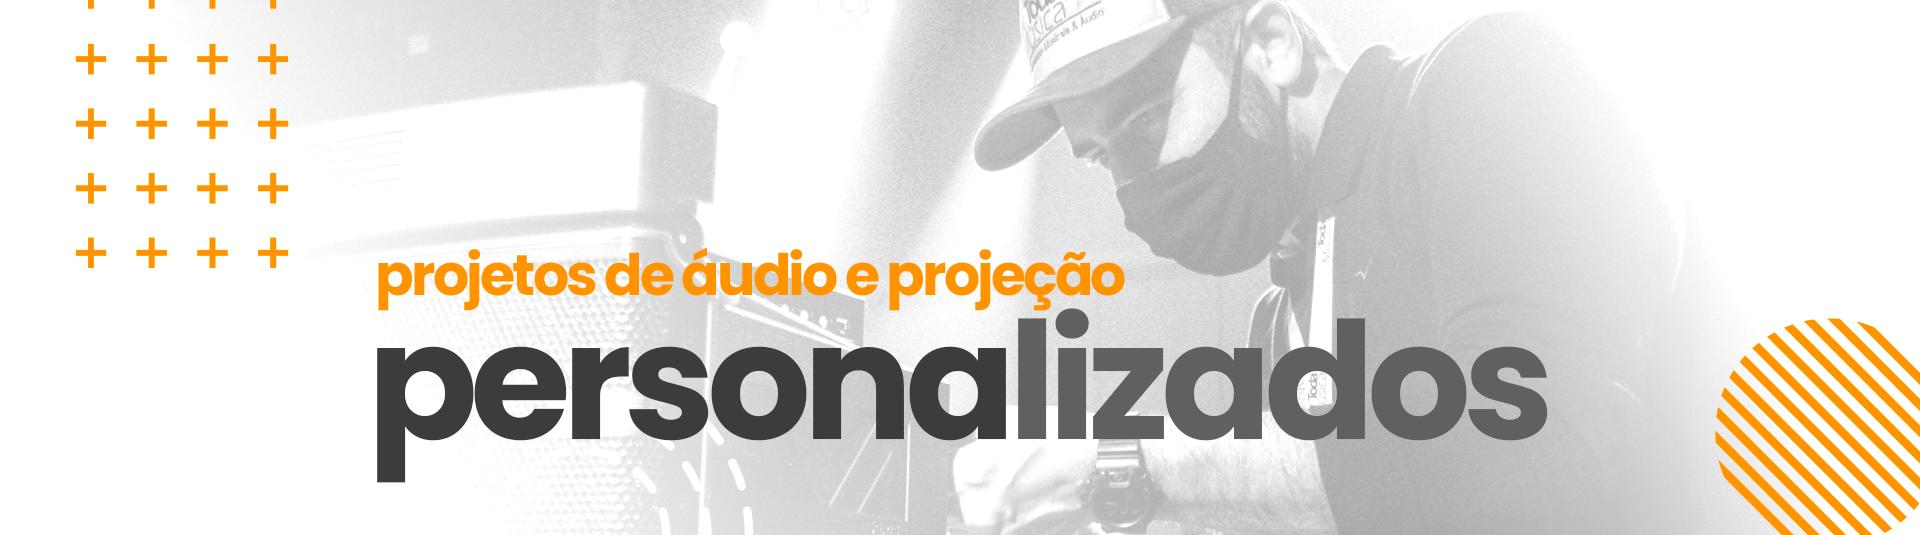 Banner Full - Projetos